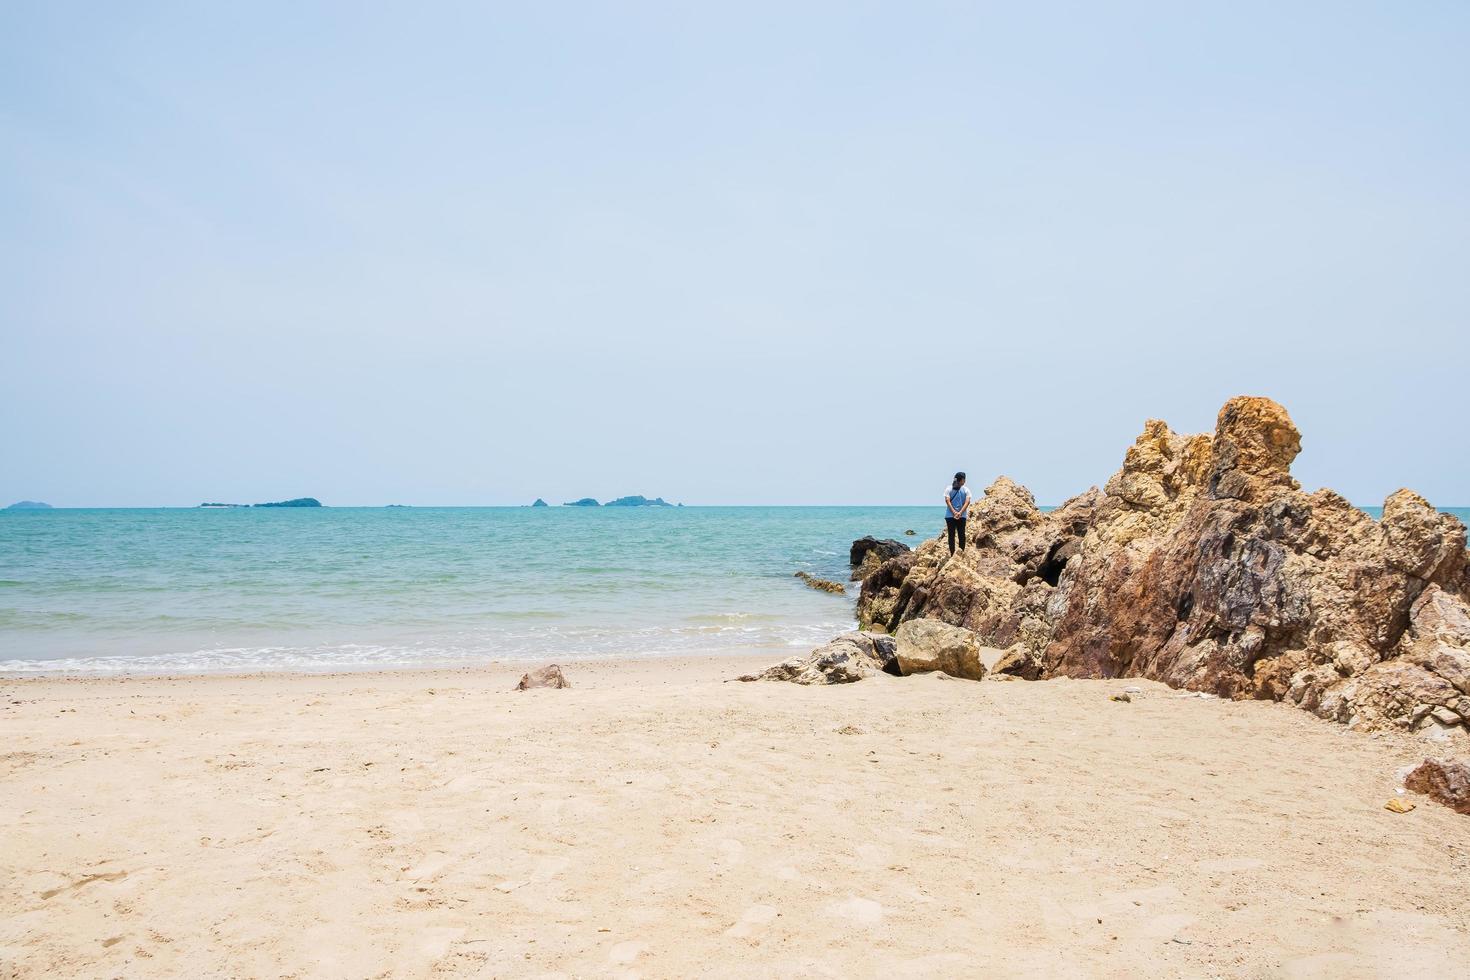 Beach and sea photo